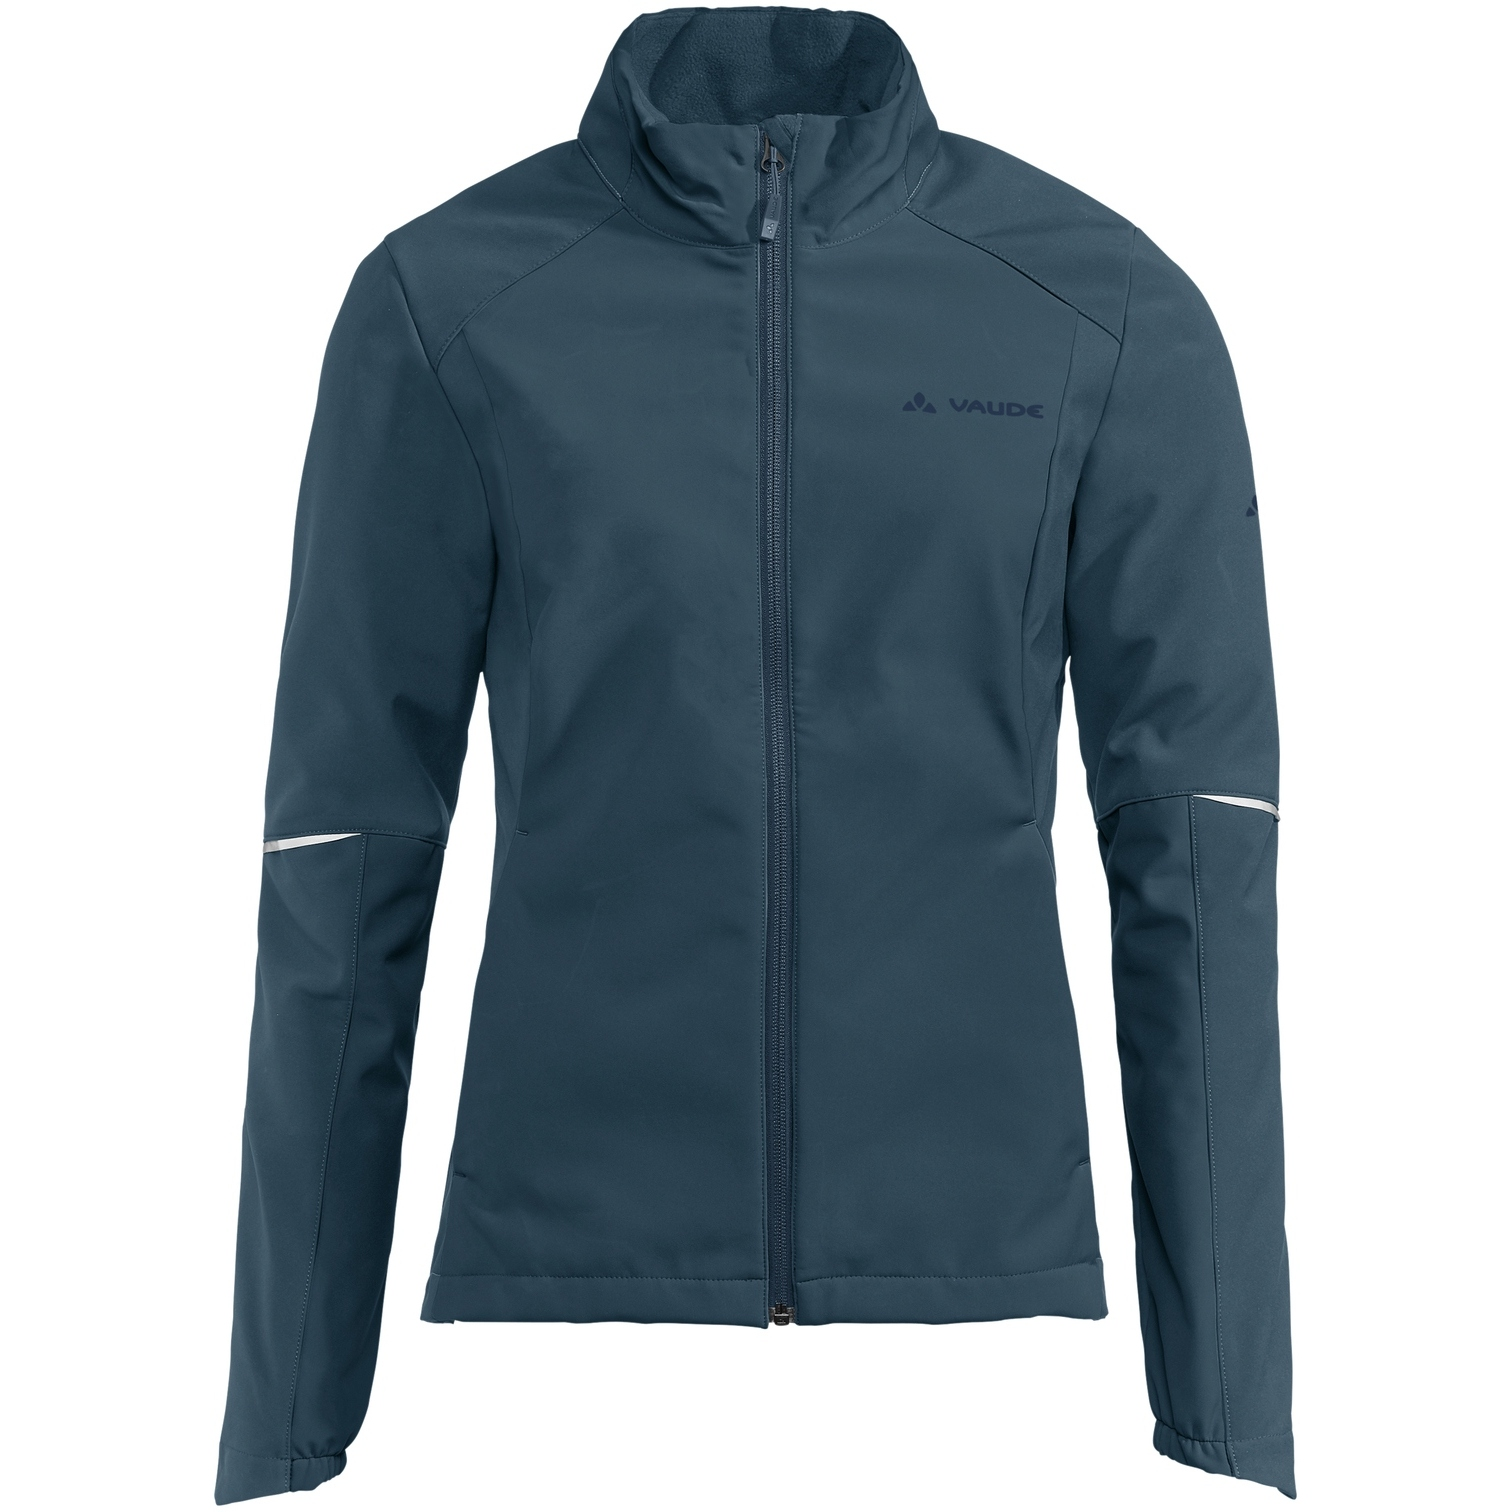 Vaude Women's Wintry Jacket IV - dark sea